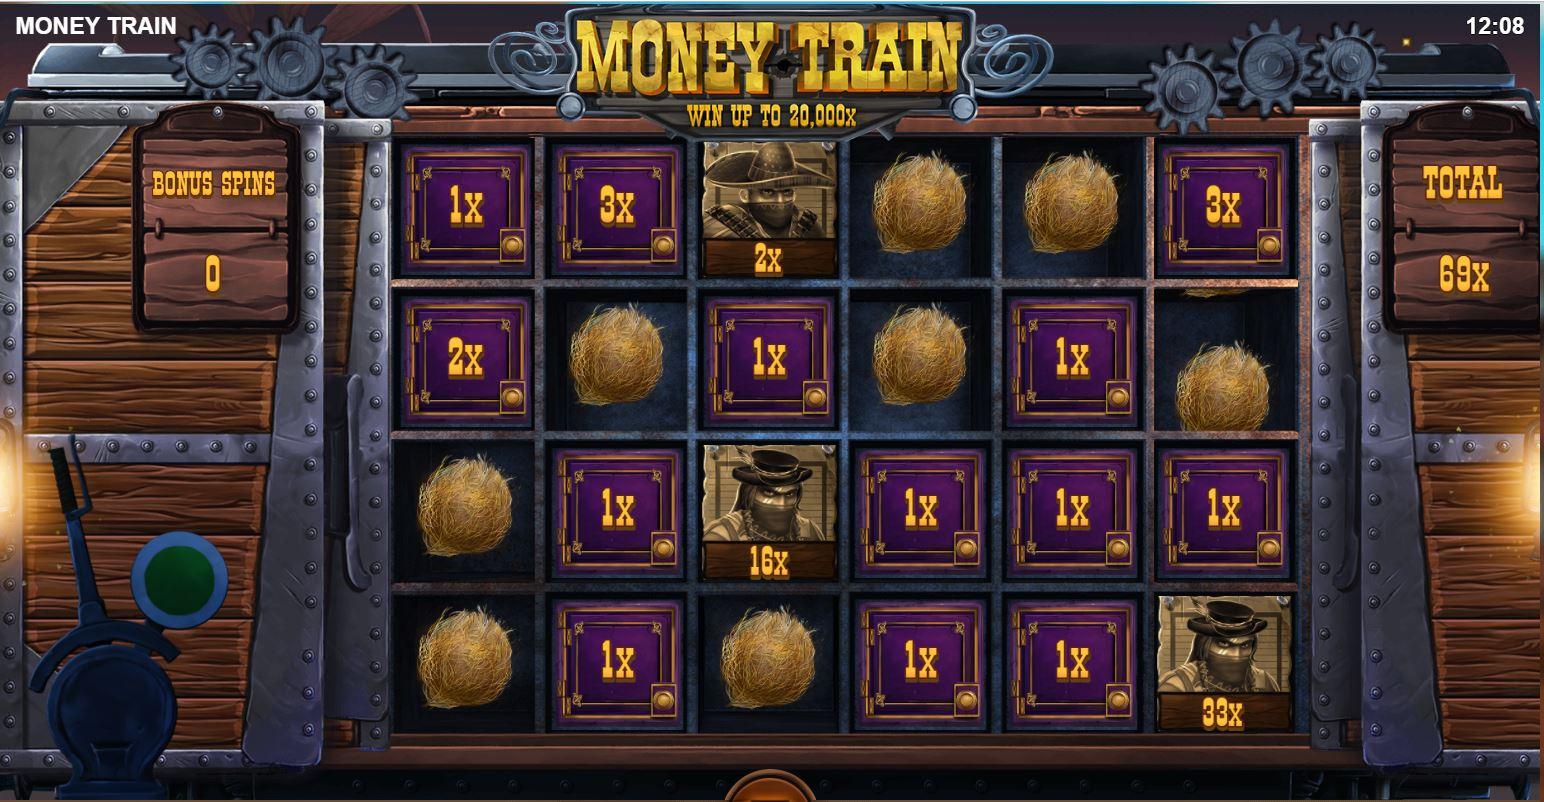 Money Train slot Bonus